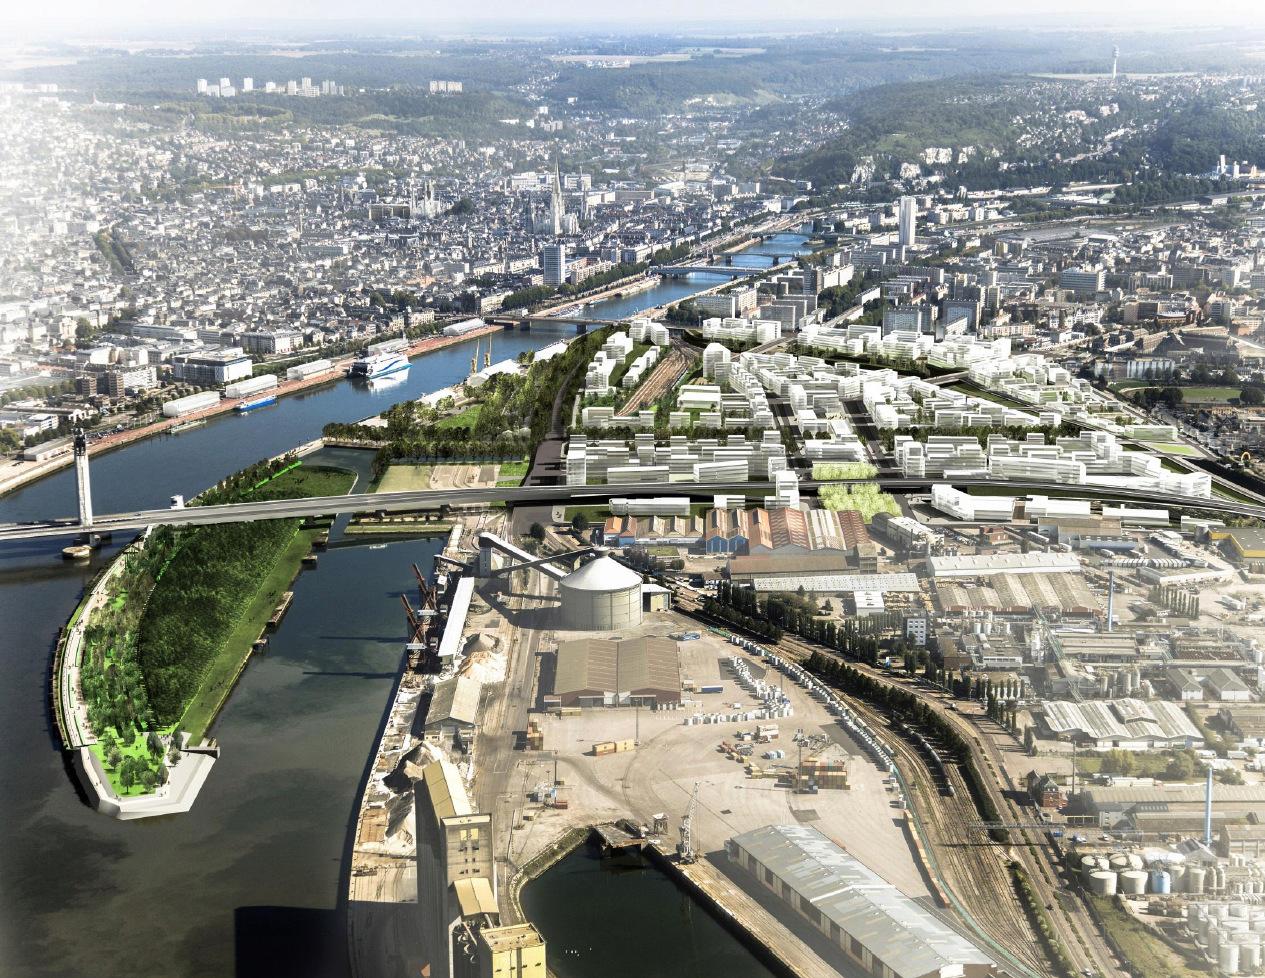 [Bientôt visible sur Google Earth] - Rouen - Ecoquartier Flaubert Birdey10